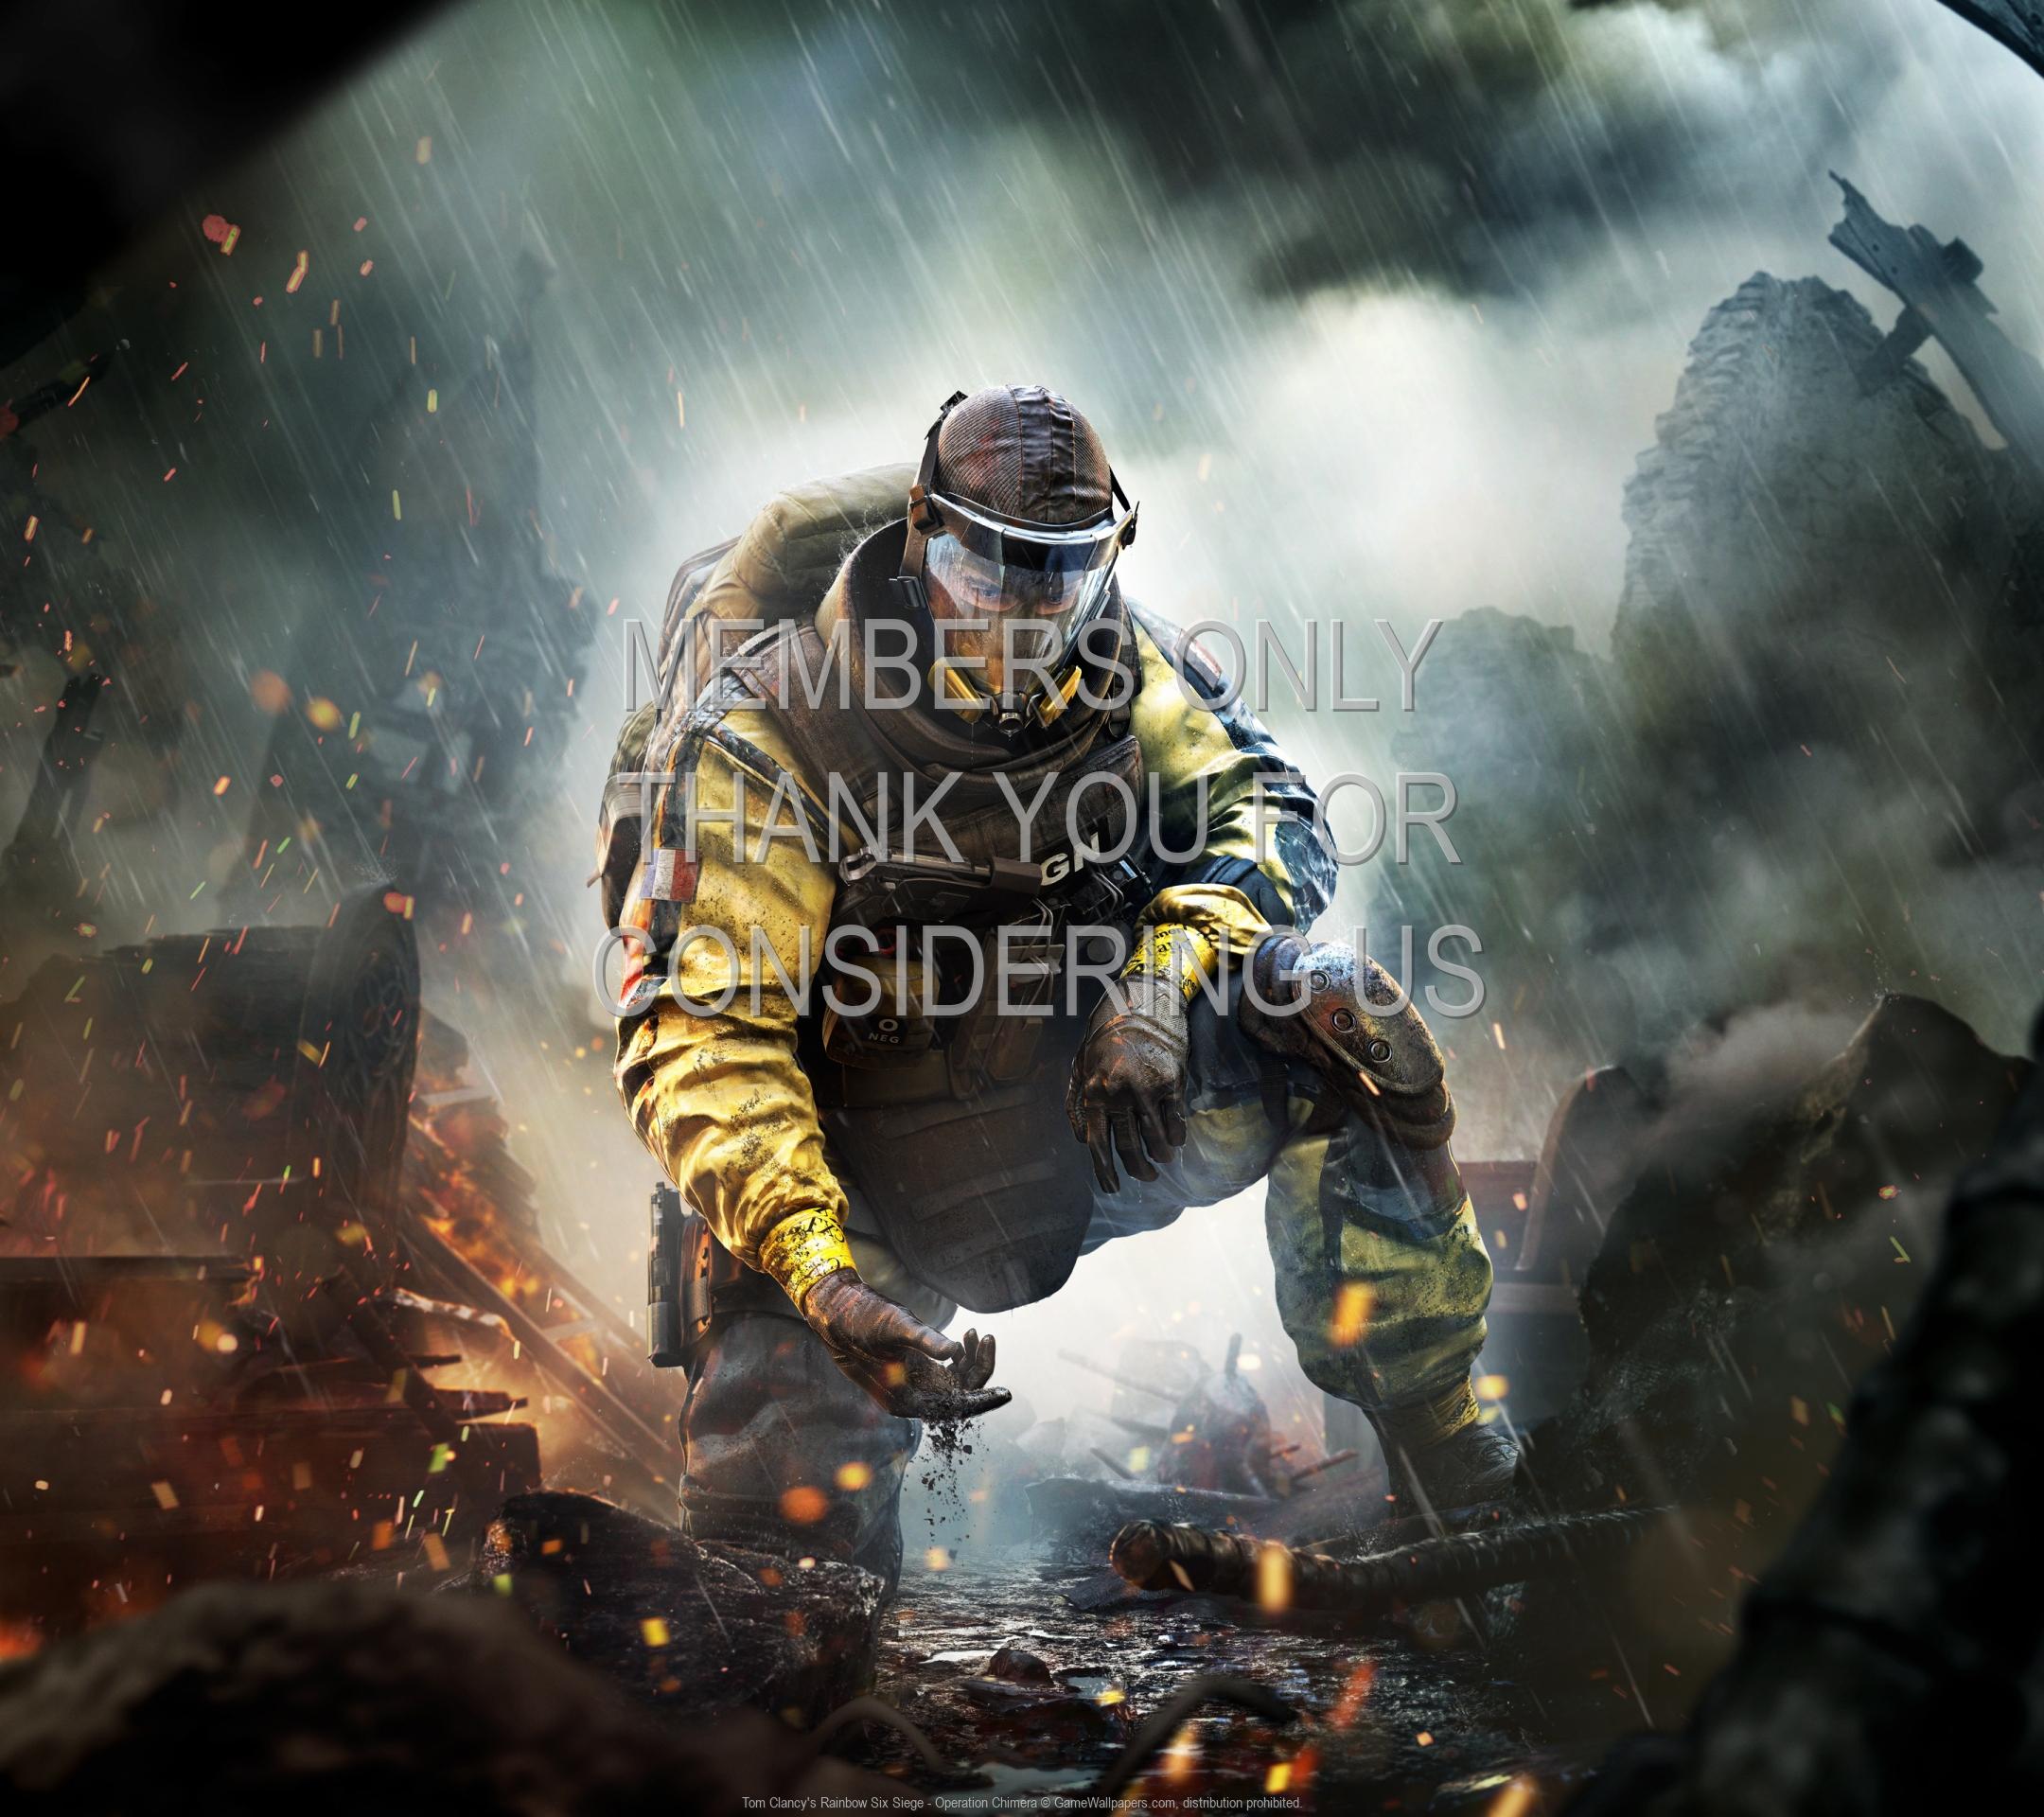 Tom Clancy's Rainbow Six: Siege - Operation Chimera 1920x1080 Mobile fond d'écran 04